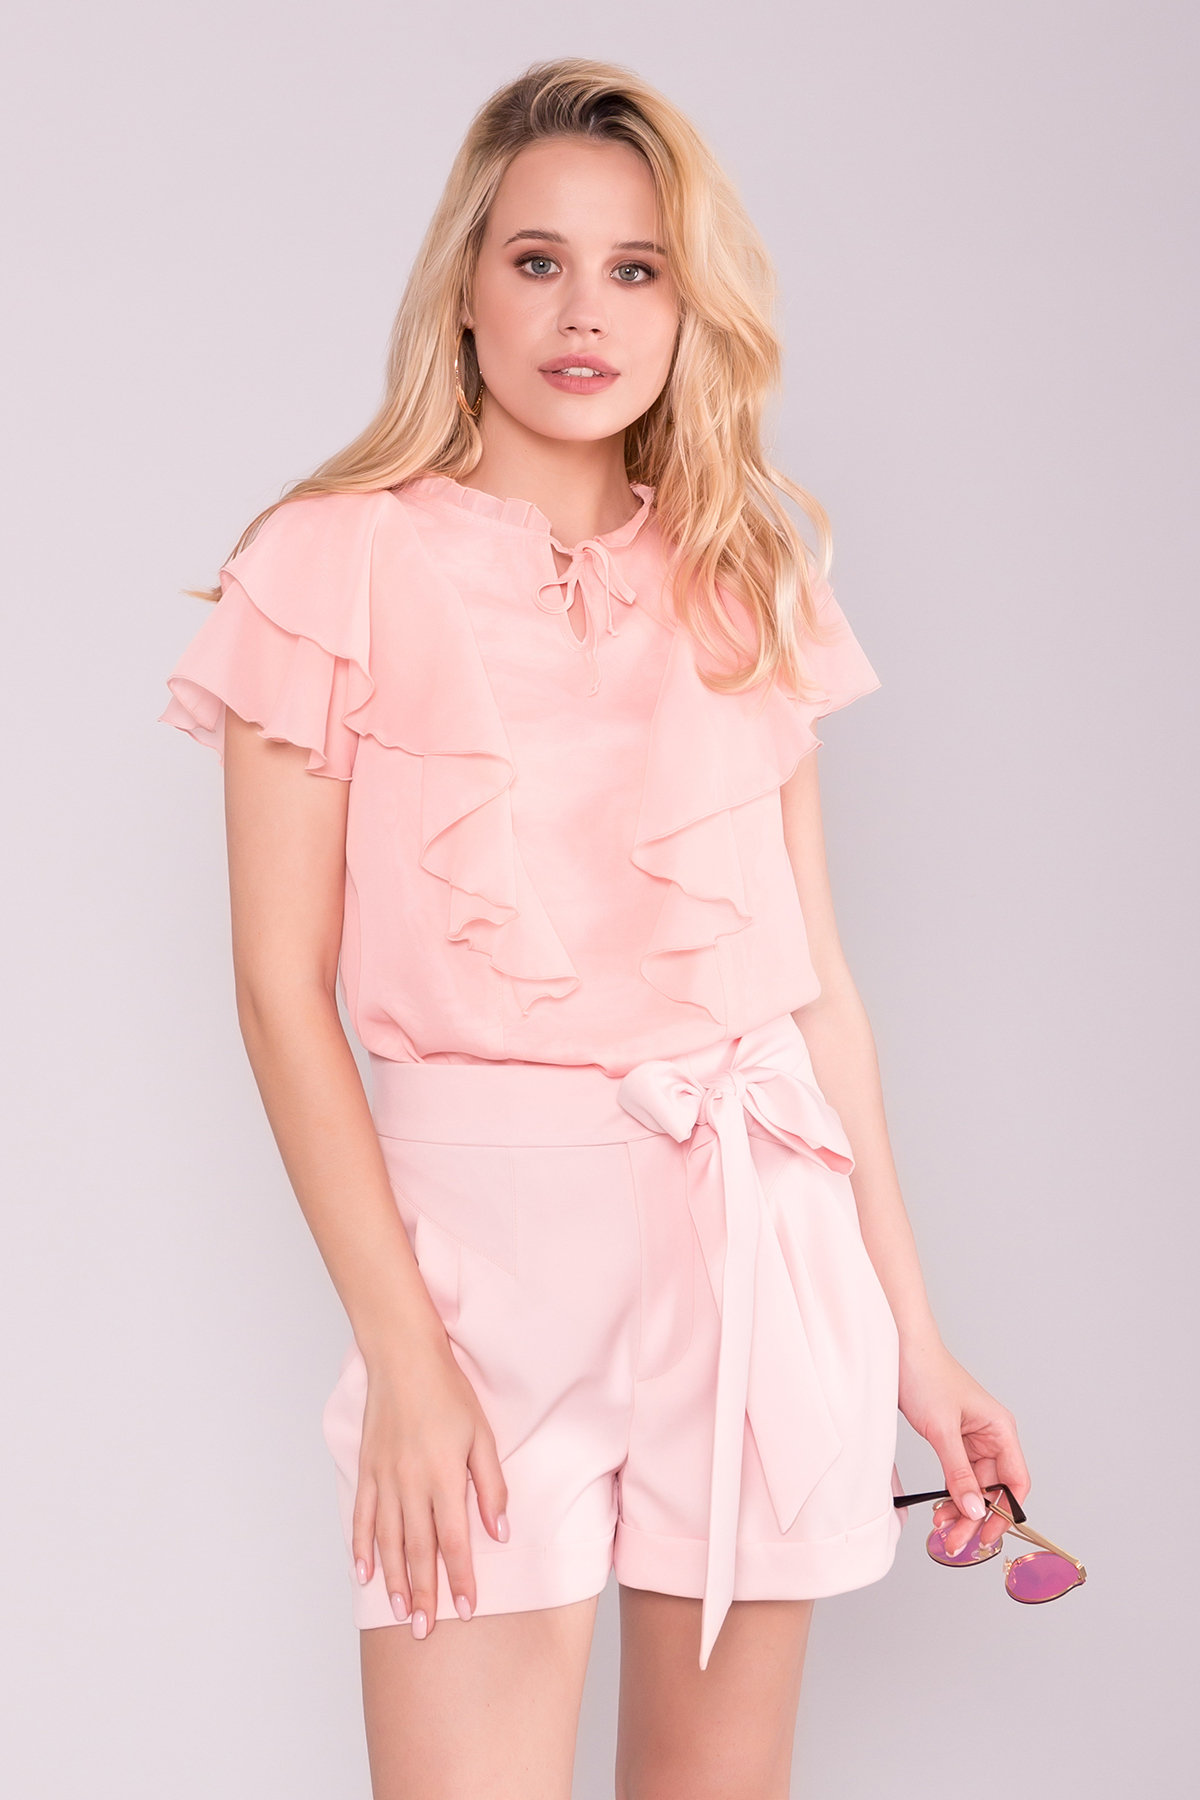 Блуза Дайан 7235 АРТ. 43157 Цвет: Пудра Светлая - фото 3, интернет магазин tm-modus.ru